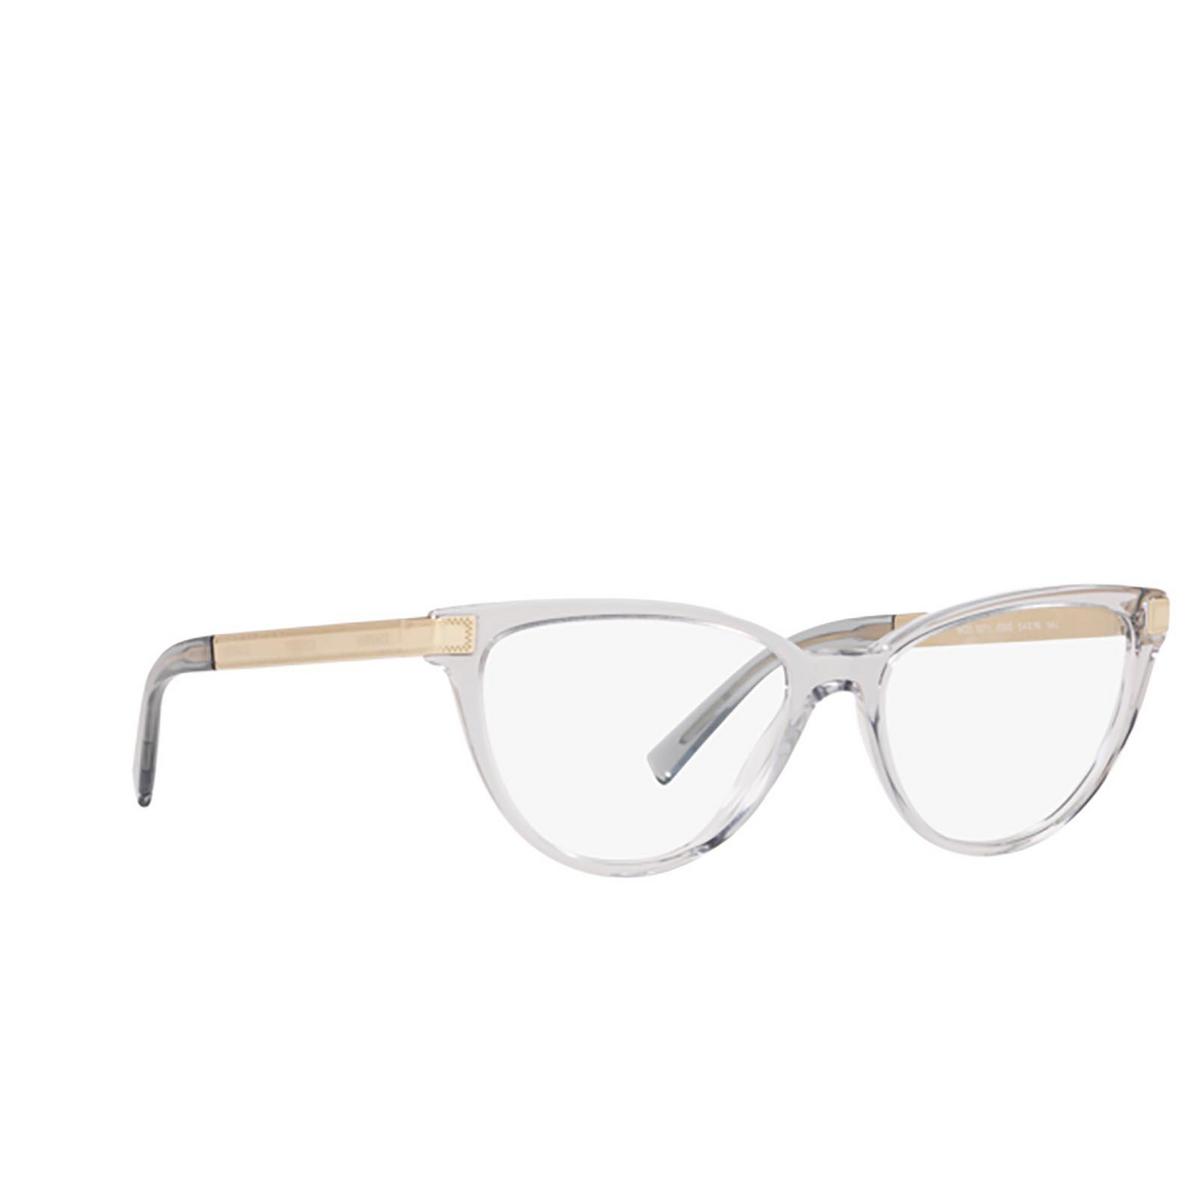 Versace® Cat-eye Eyeglasses: VE3271 color Transparent Grey 5305 - three-quarters view.